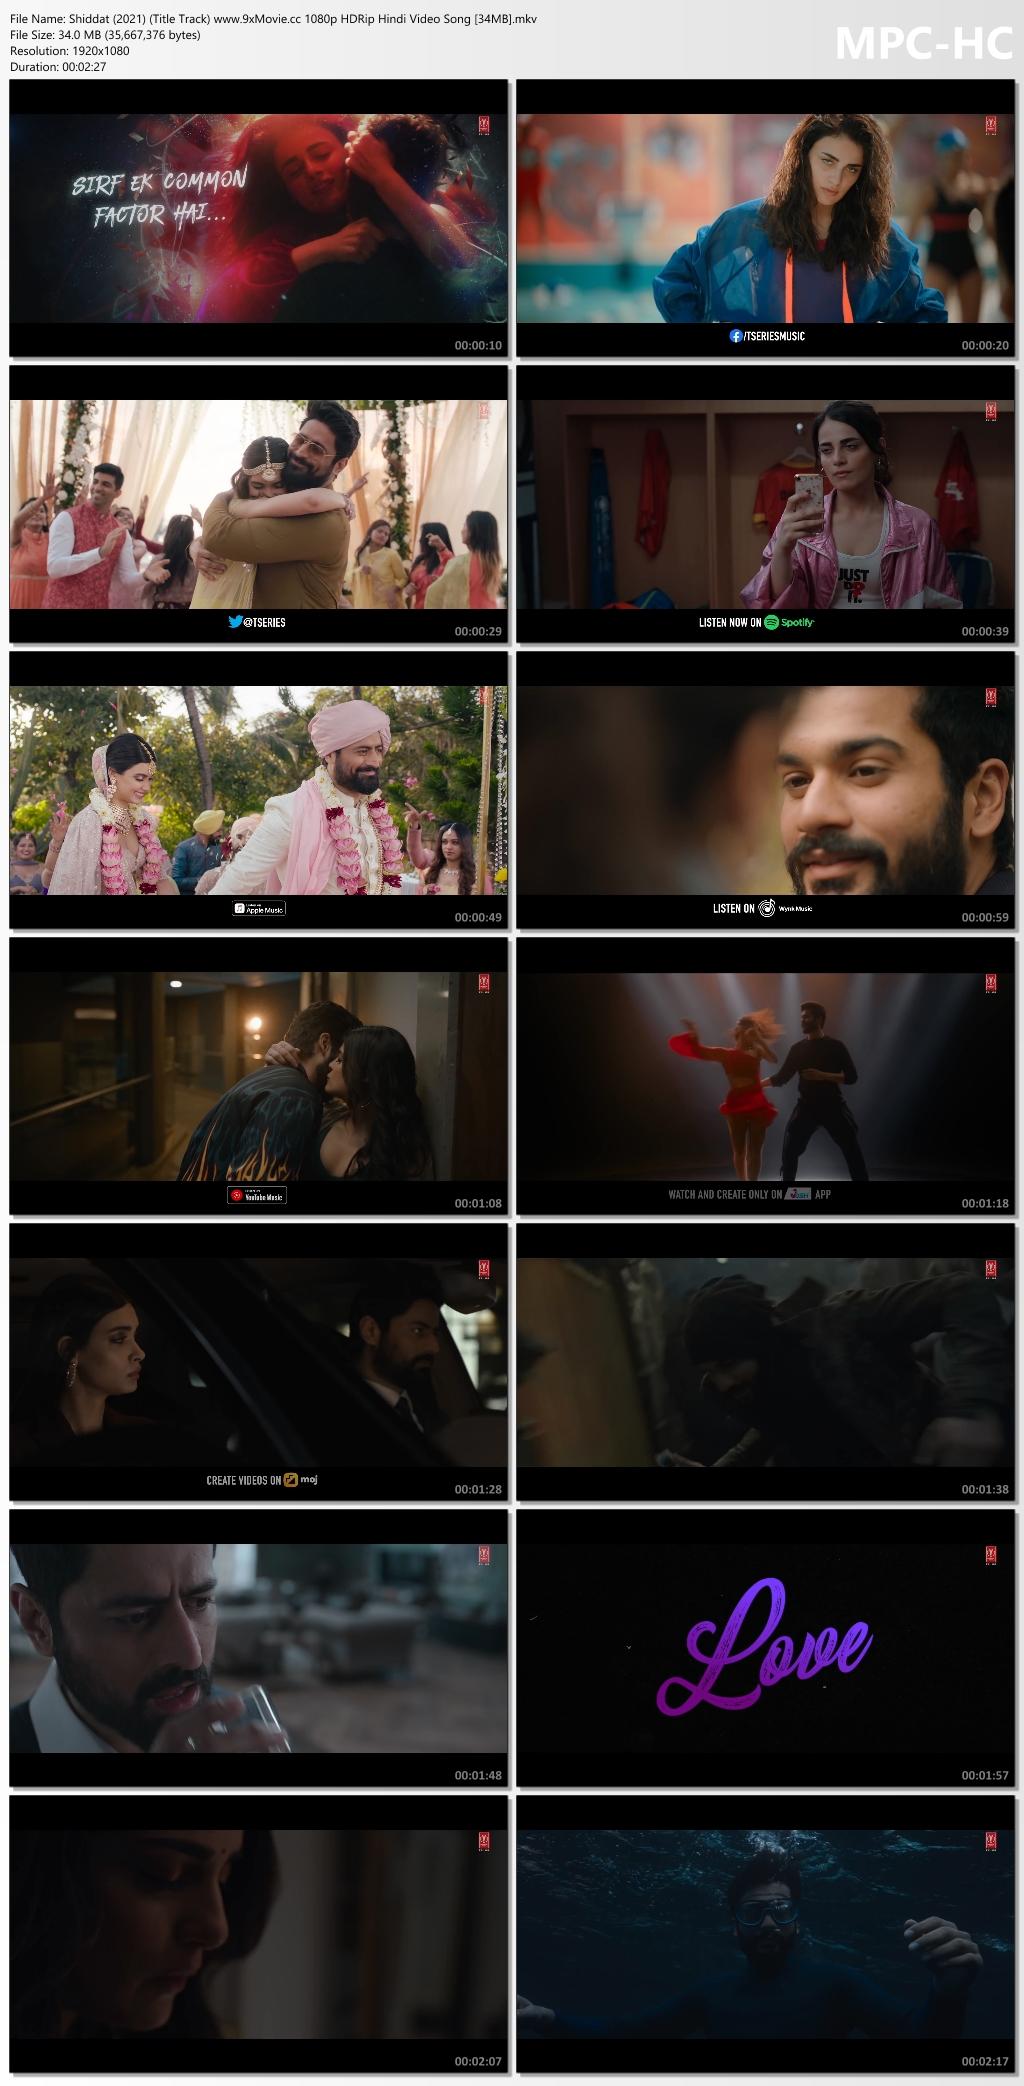 Shiddat-2021-Title-Track-www-9x-Movie-cc-1080p-HDRip-Hindi-Video-Song-34-MB-mkv